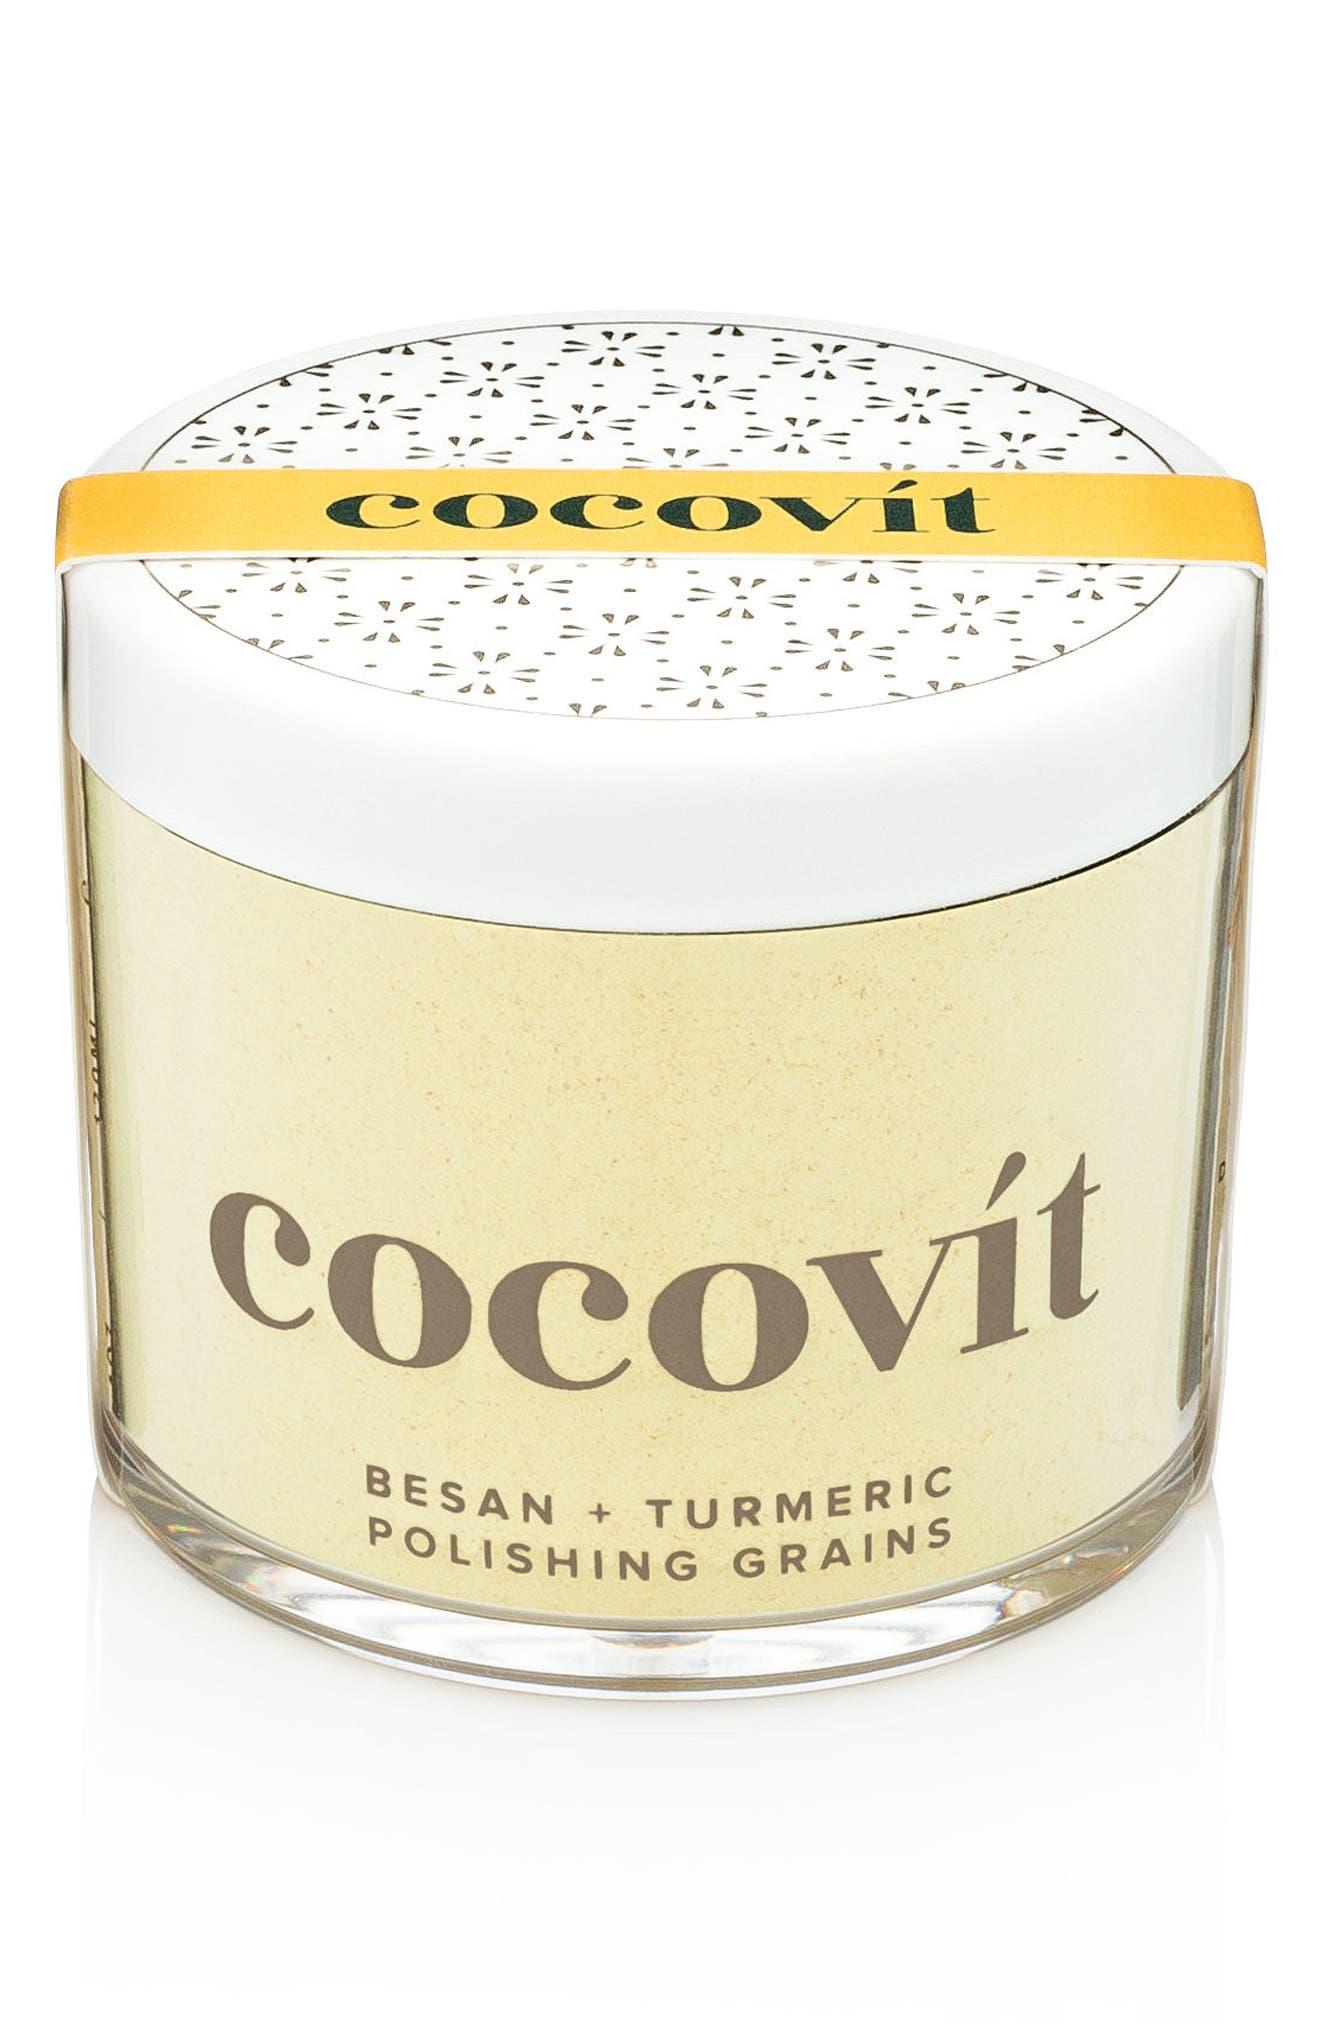 Alternate Image 1 Selected - Cocovit Besan + Turmeric Polishing Grains